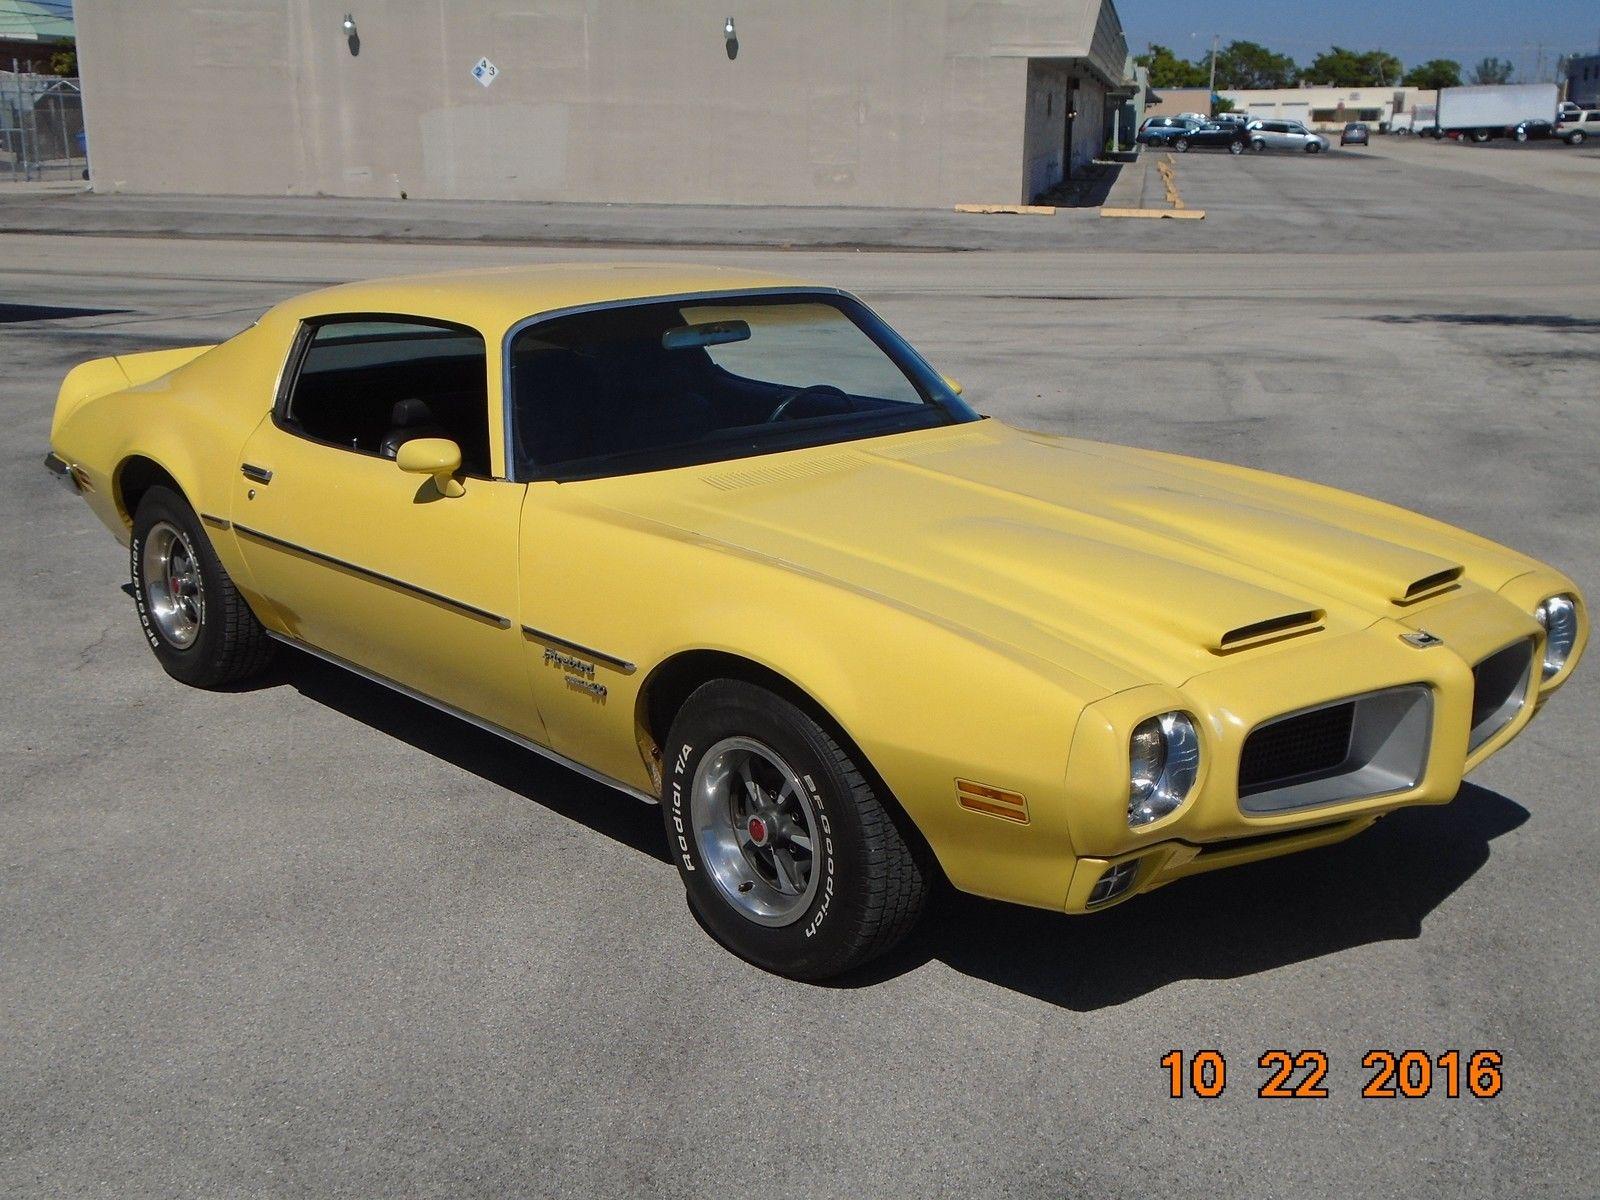 1968 Camaro Project For Sale >> 1970 Pontiac Firebird Formula 400 - Project Cars For Sale